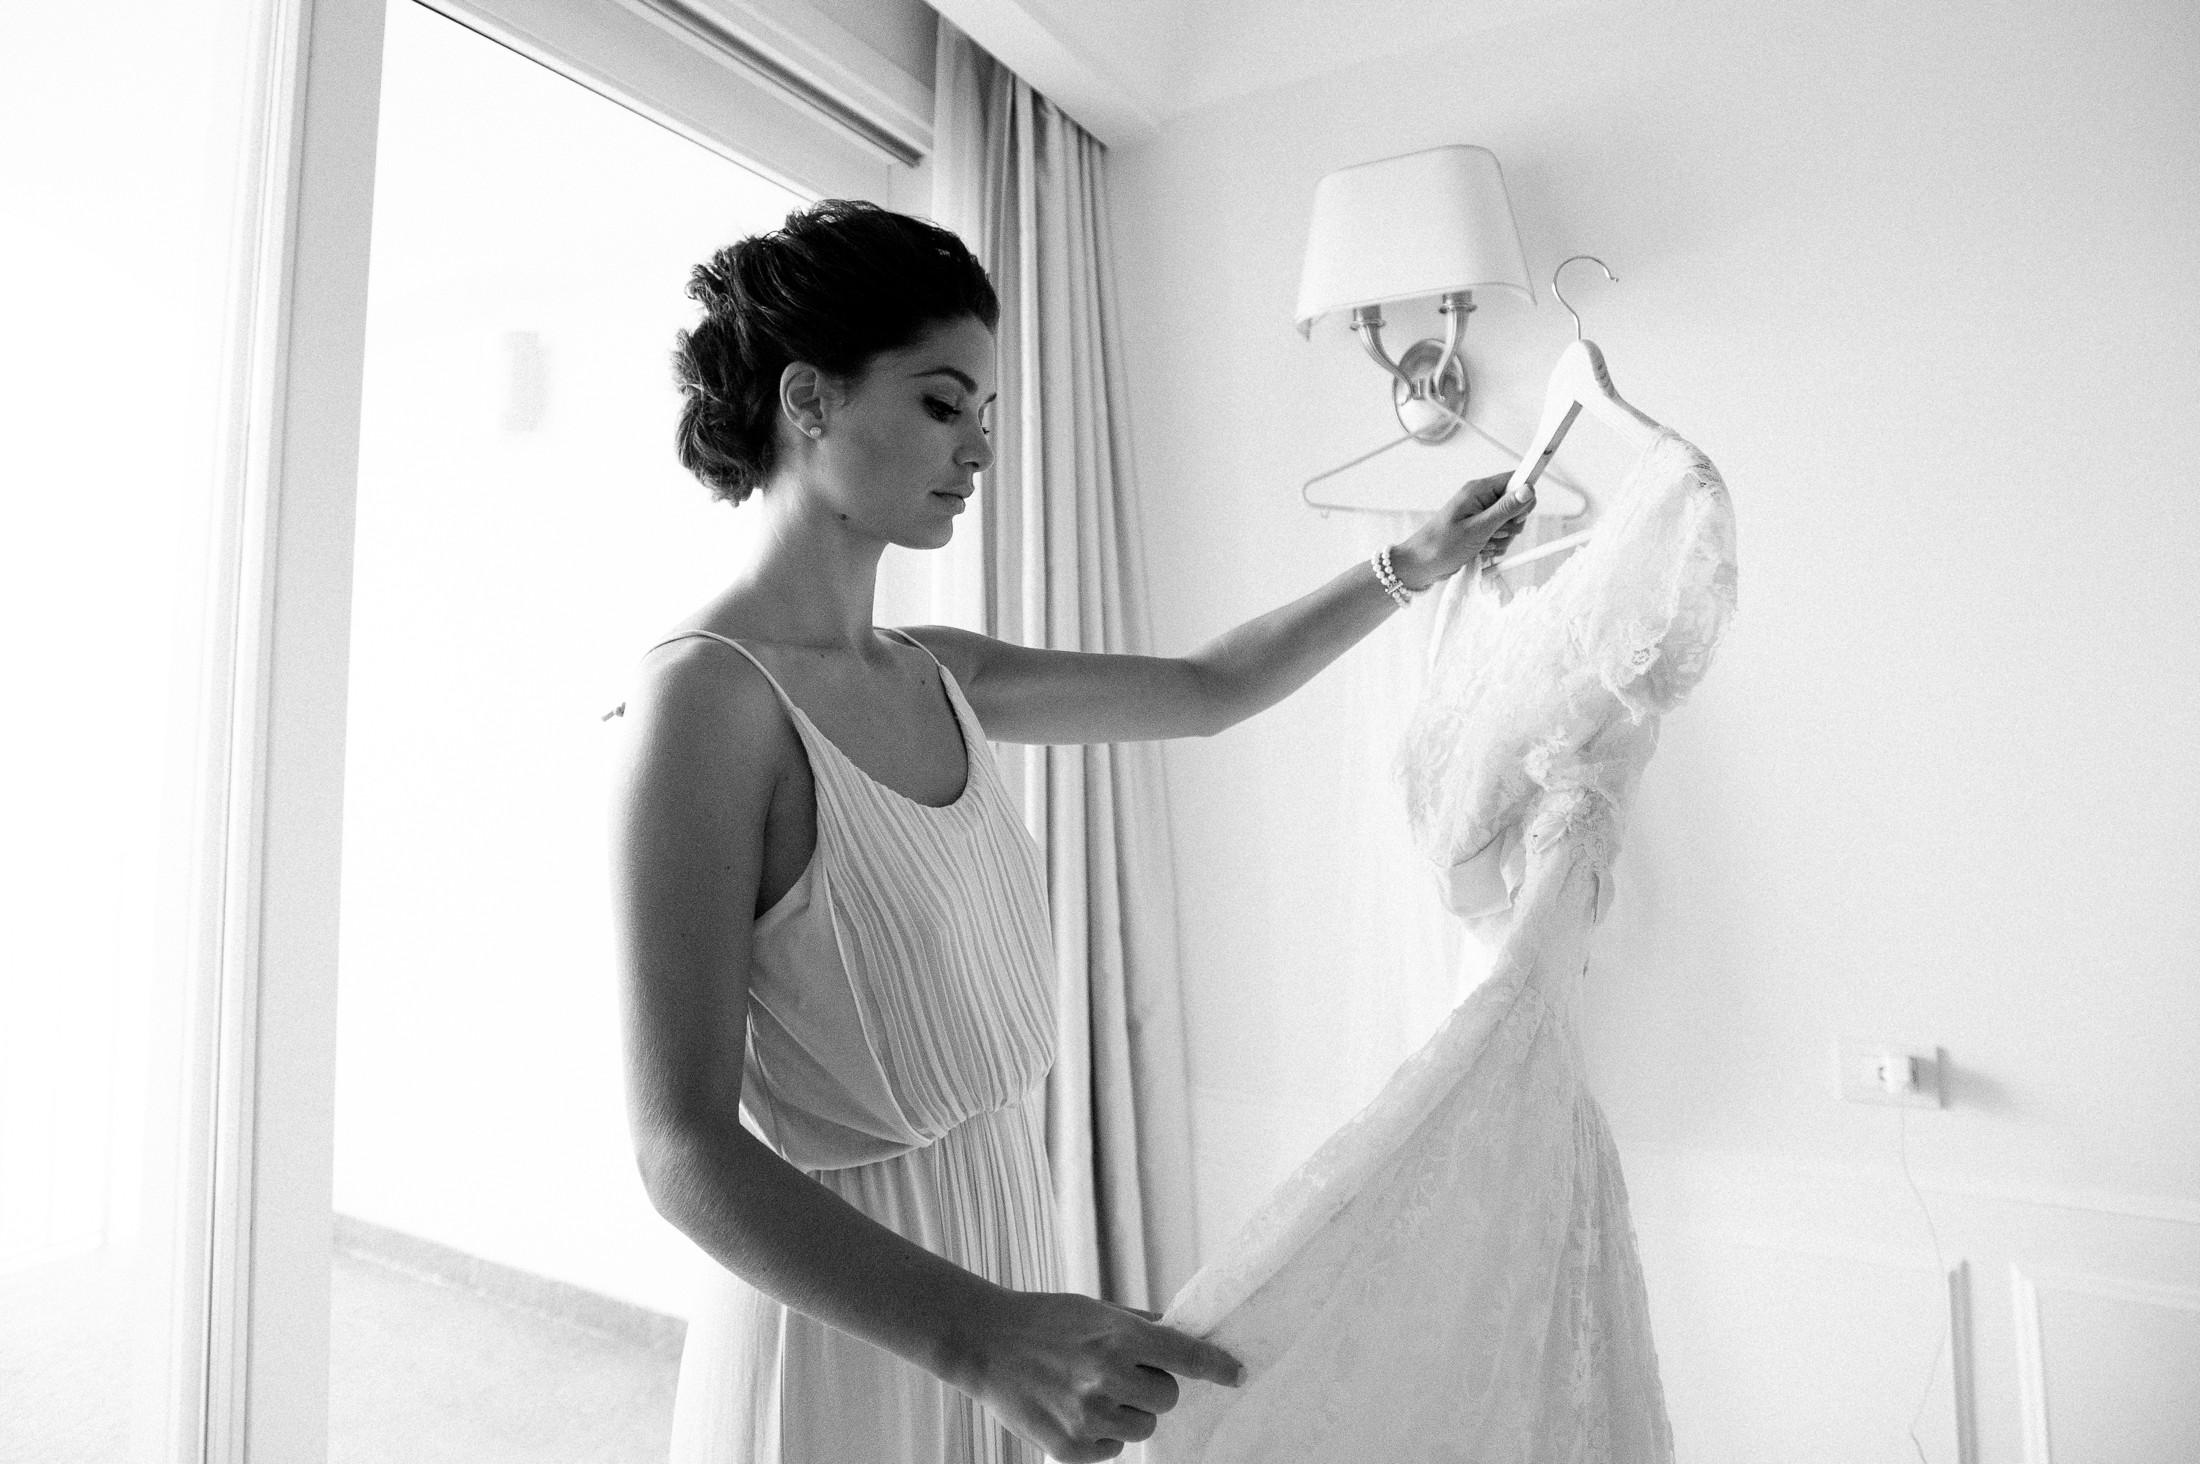 bride's hold her wedding dress